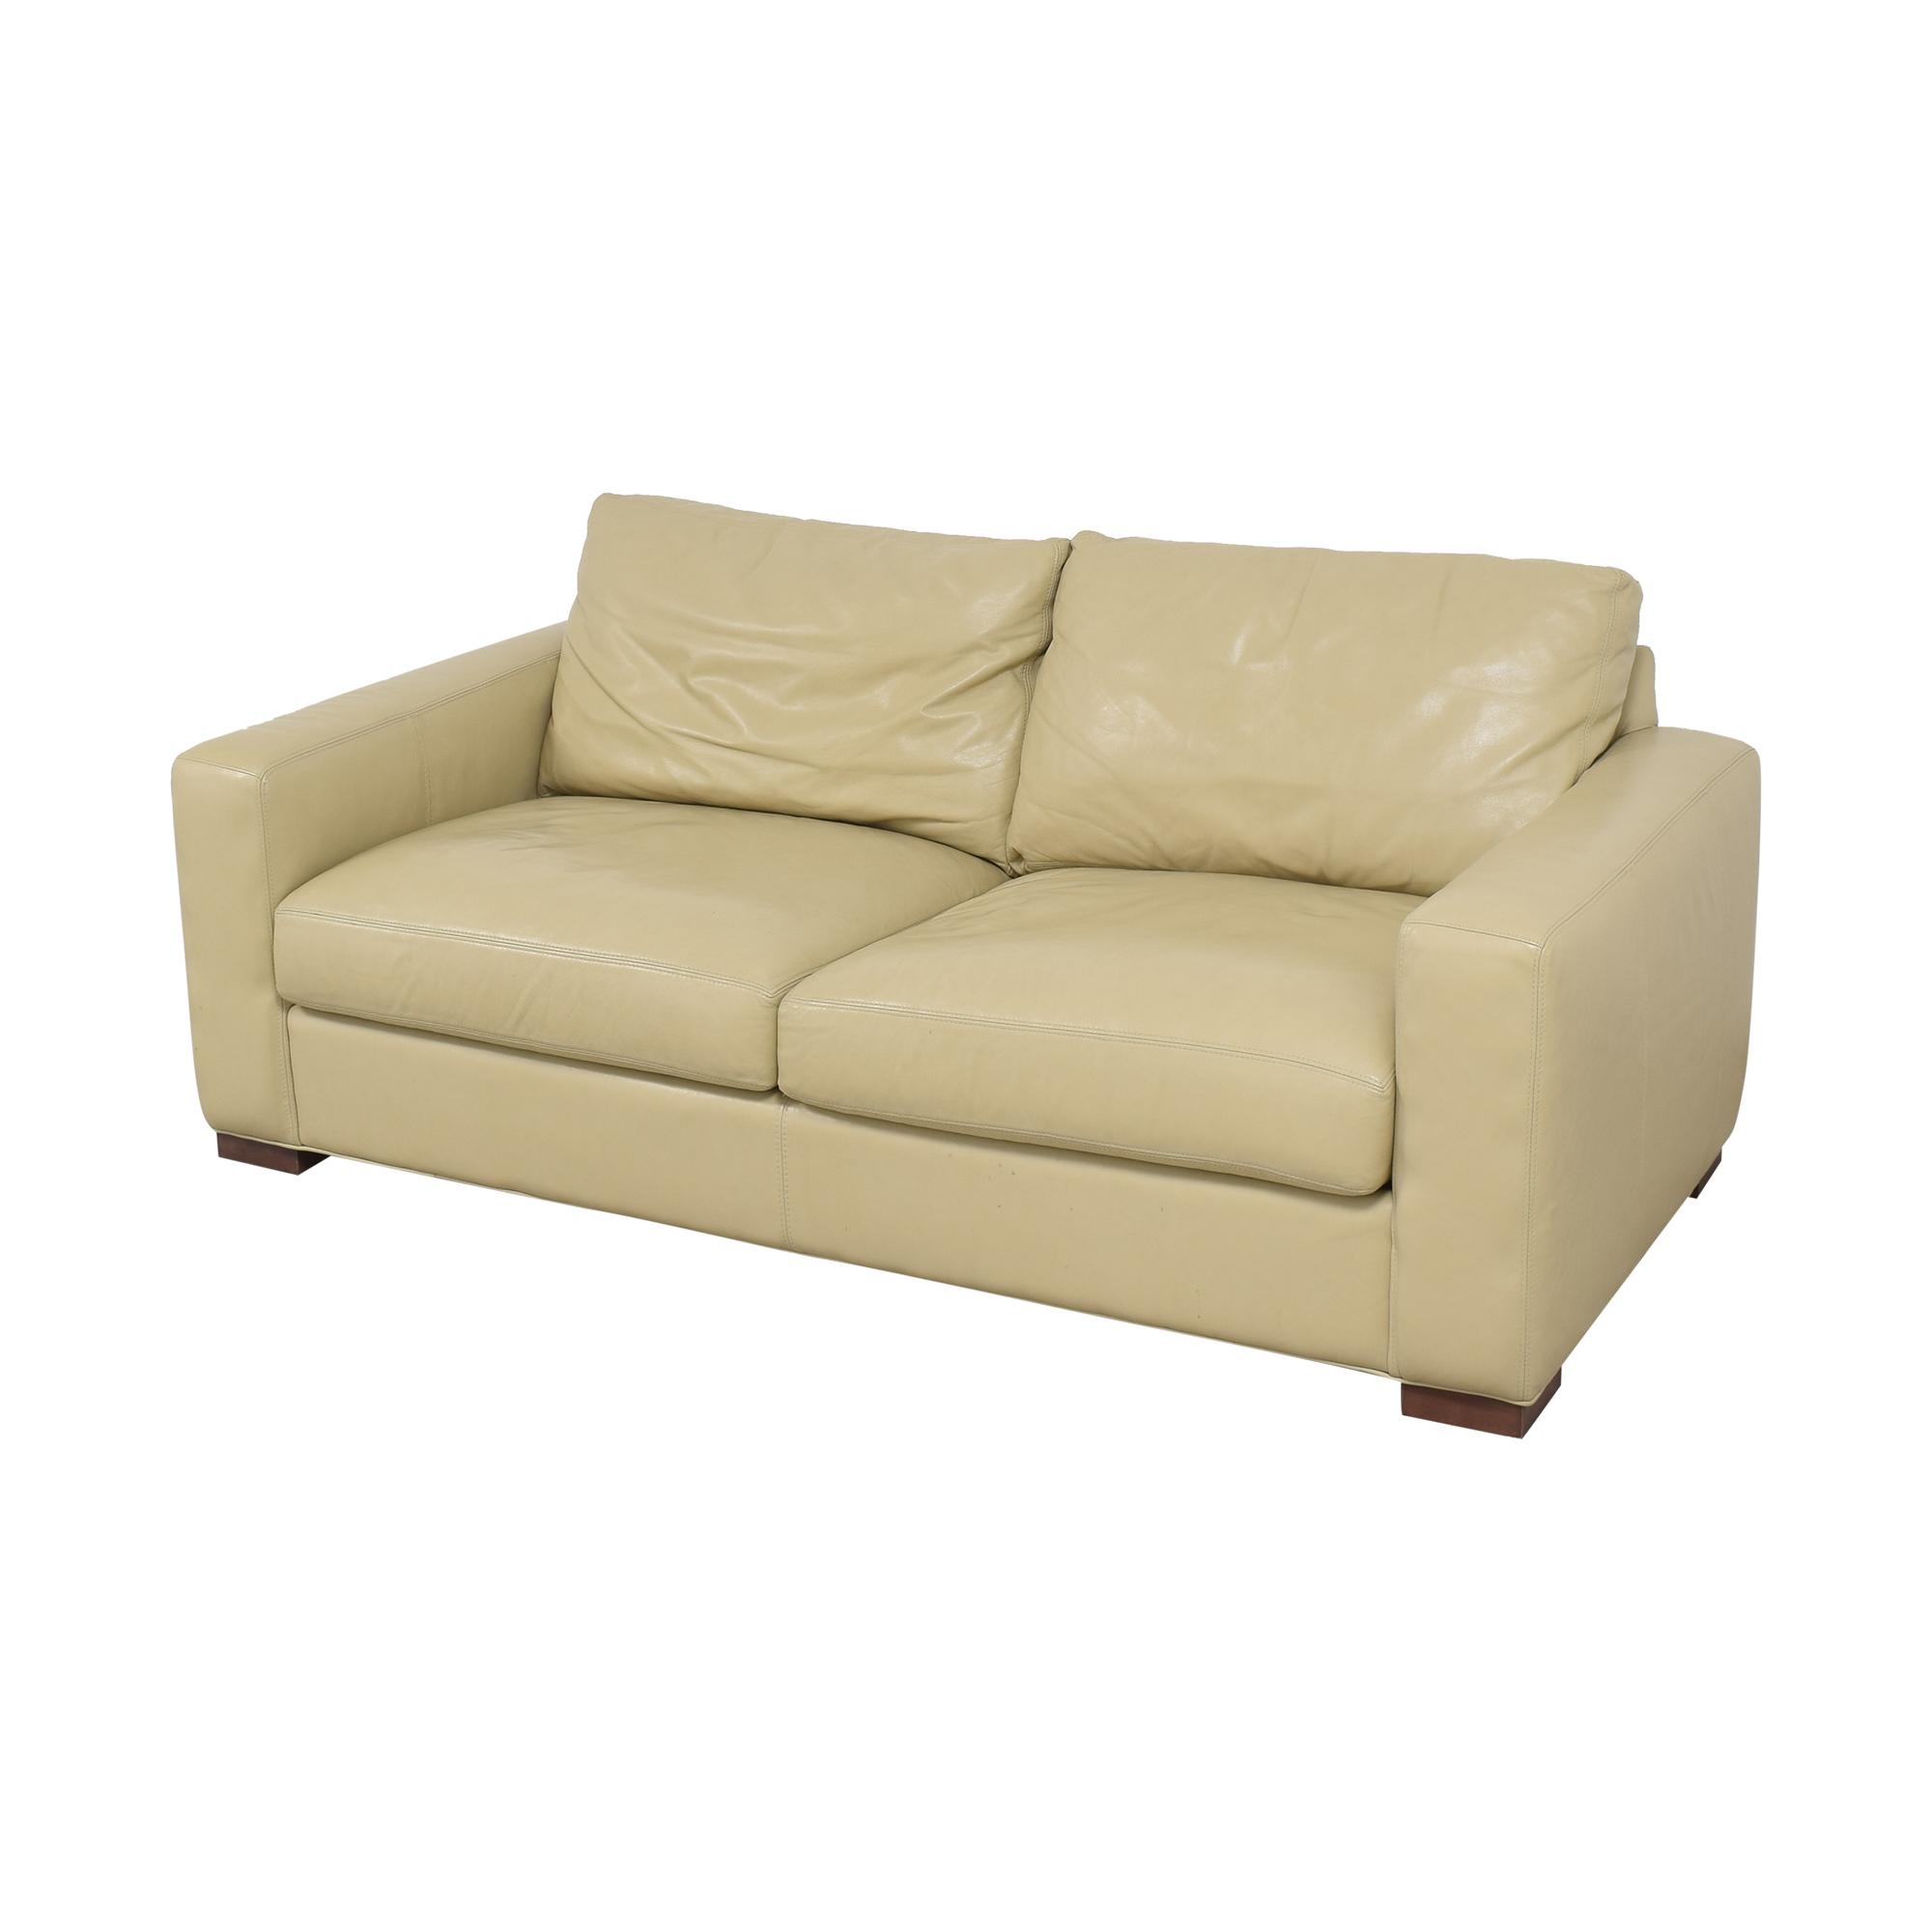 shop Room & Board Two Cushion Sofa Room & Board Classic Sofas